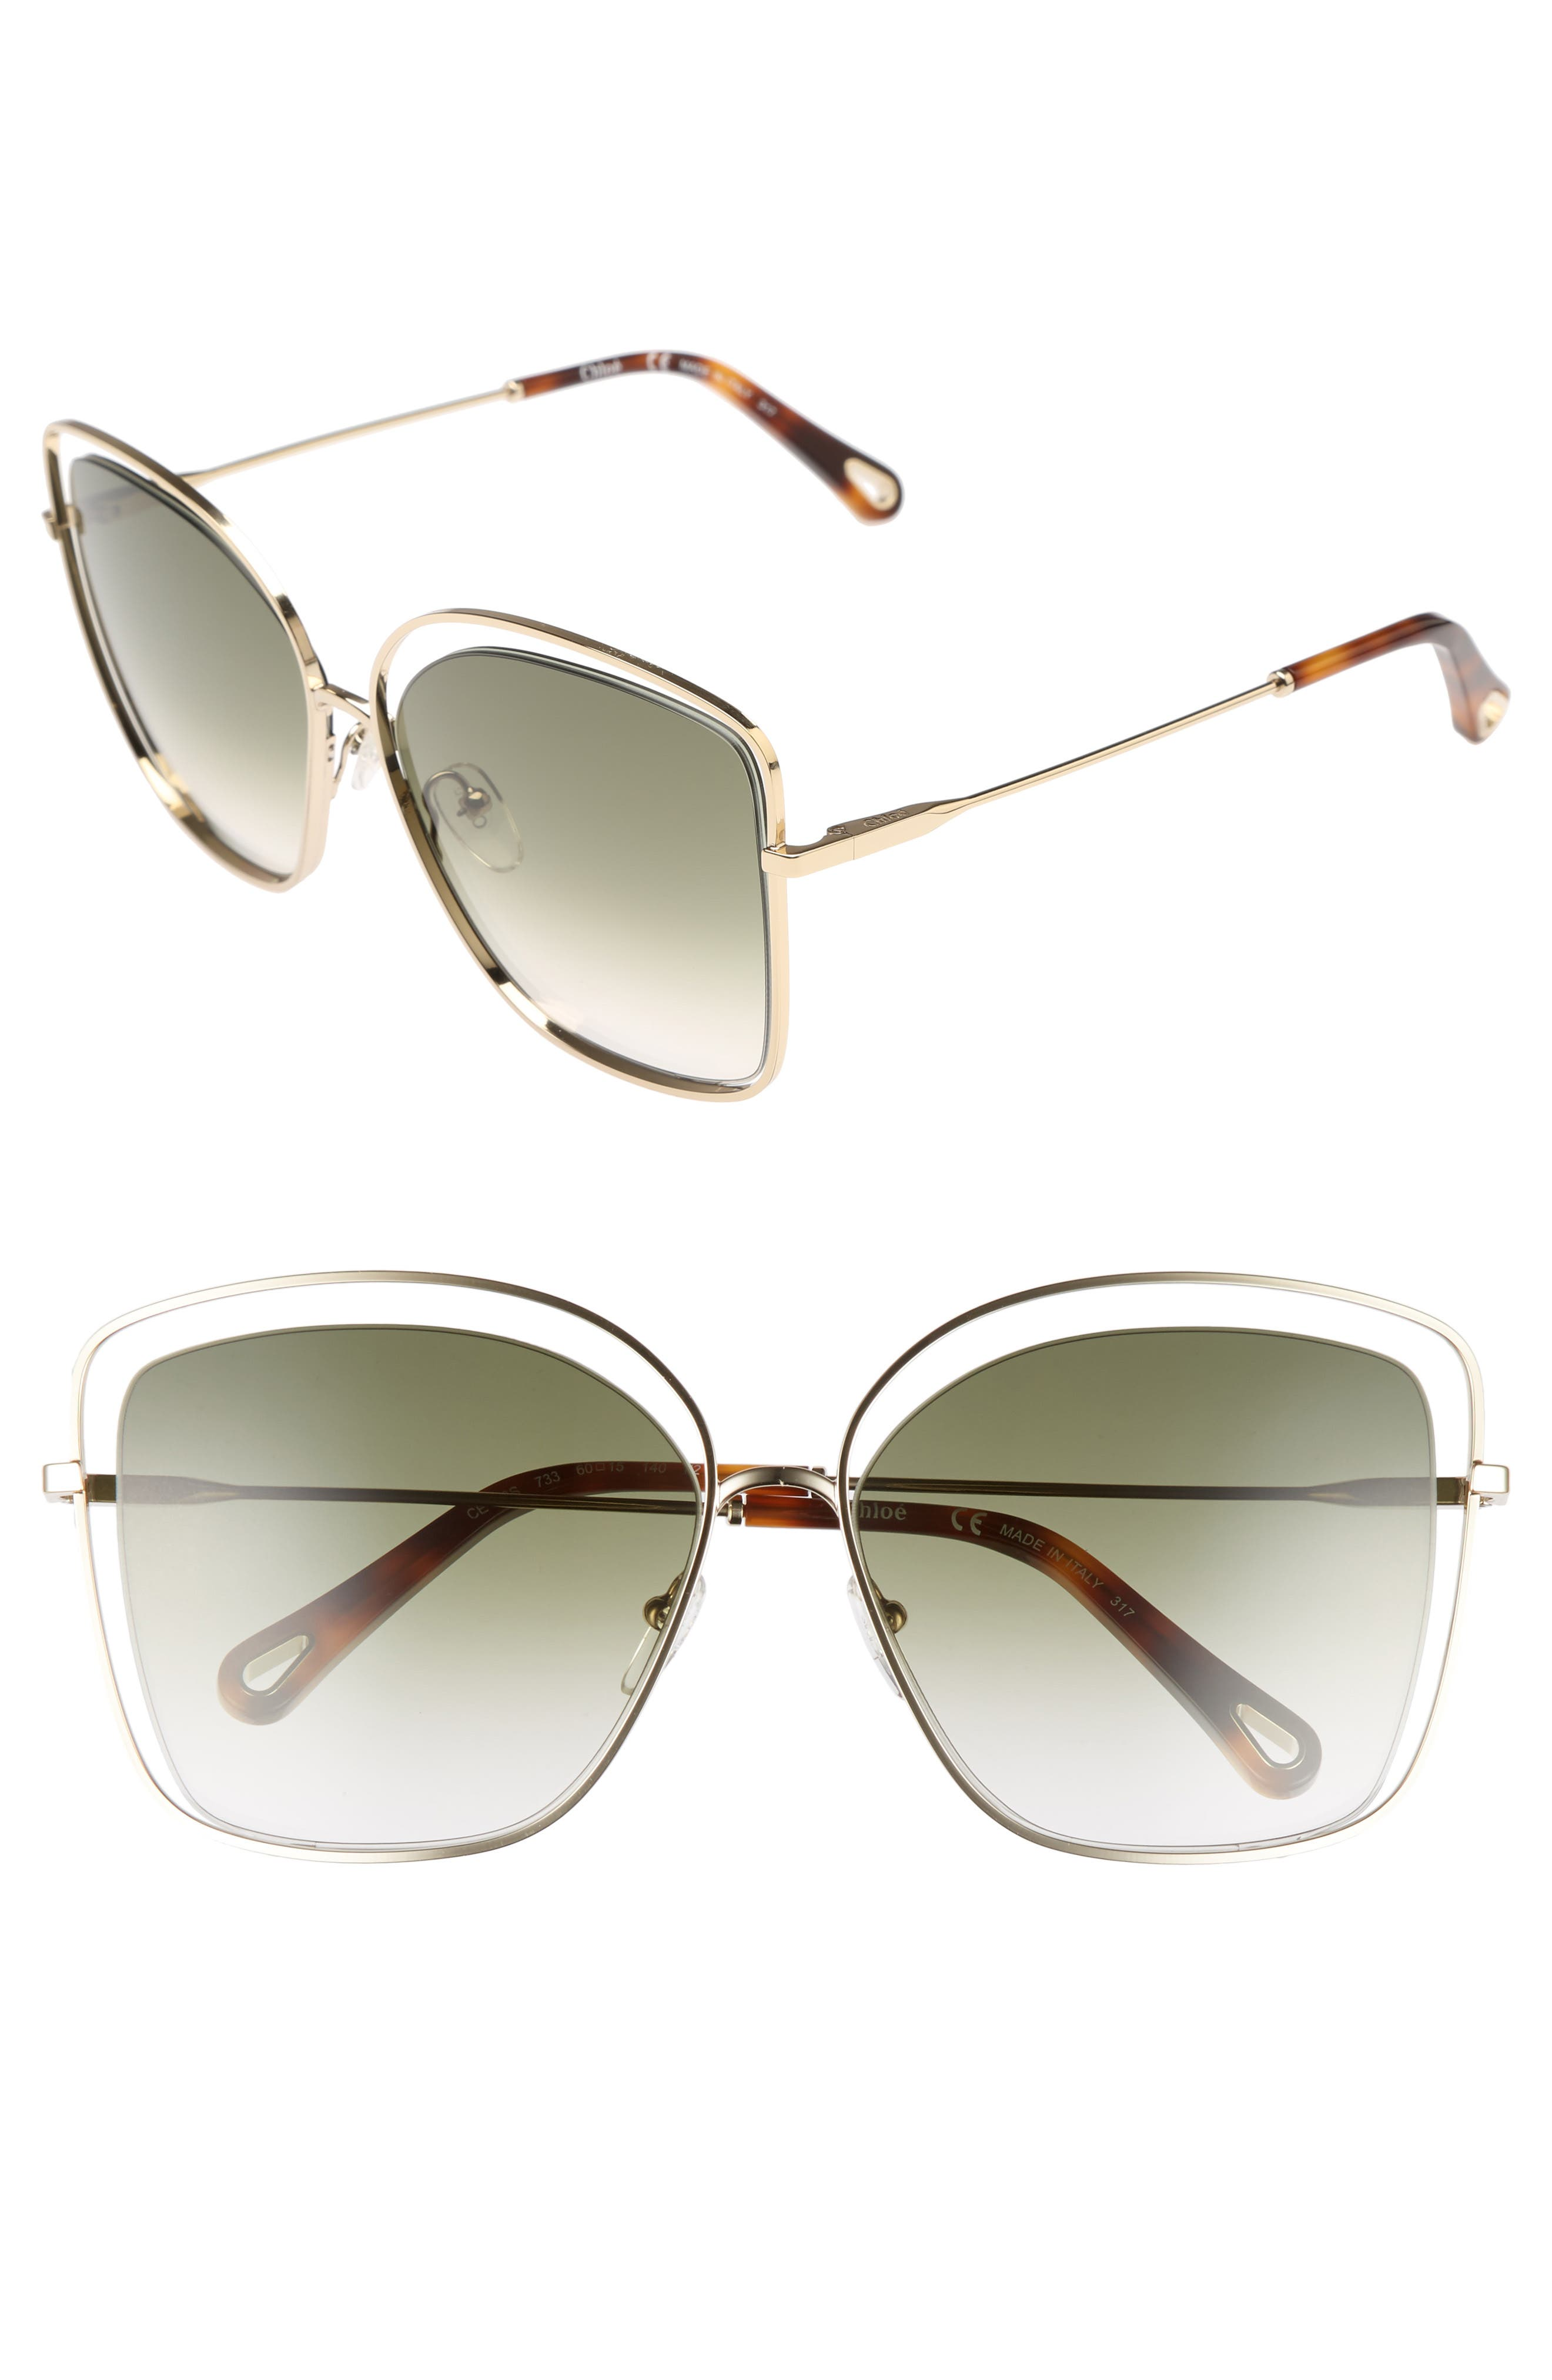 Chloe 60Mm Halo Frame Sunglasses -